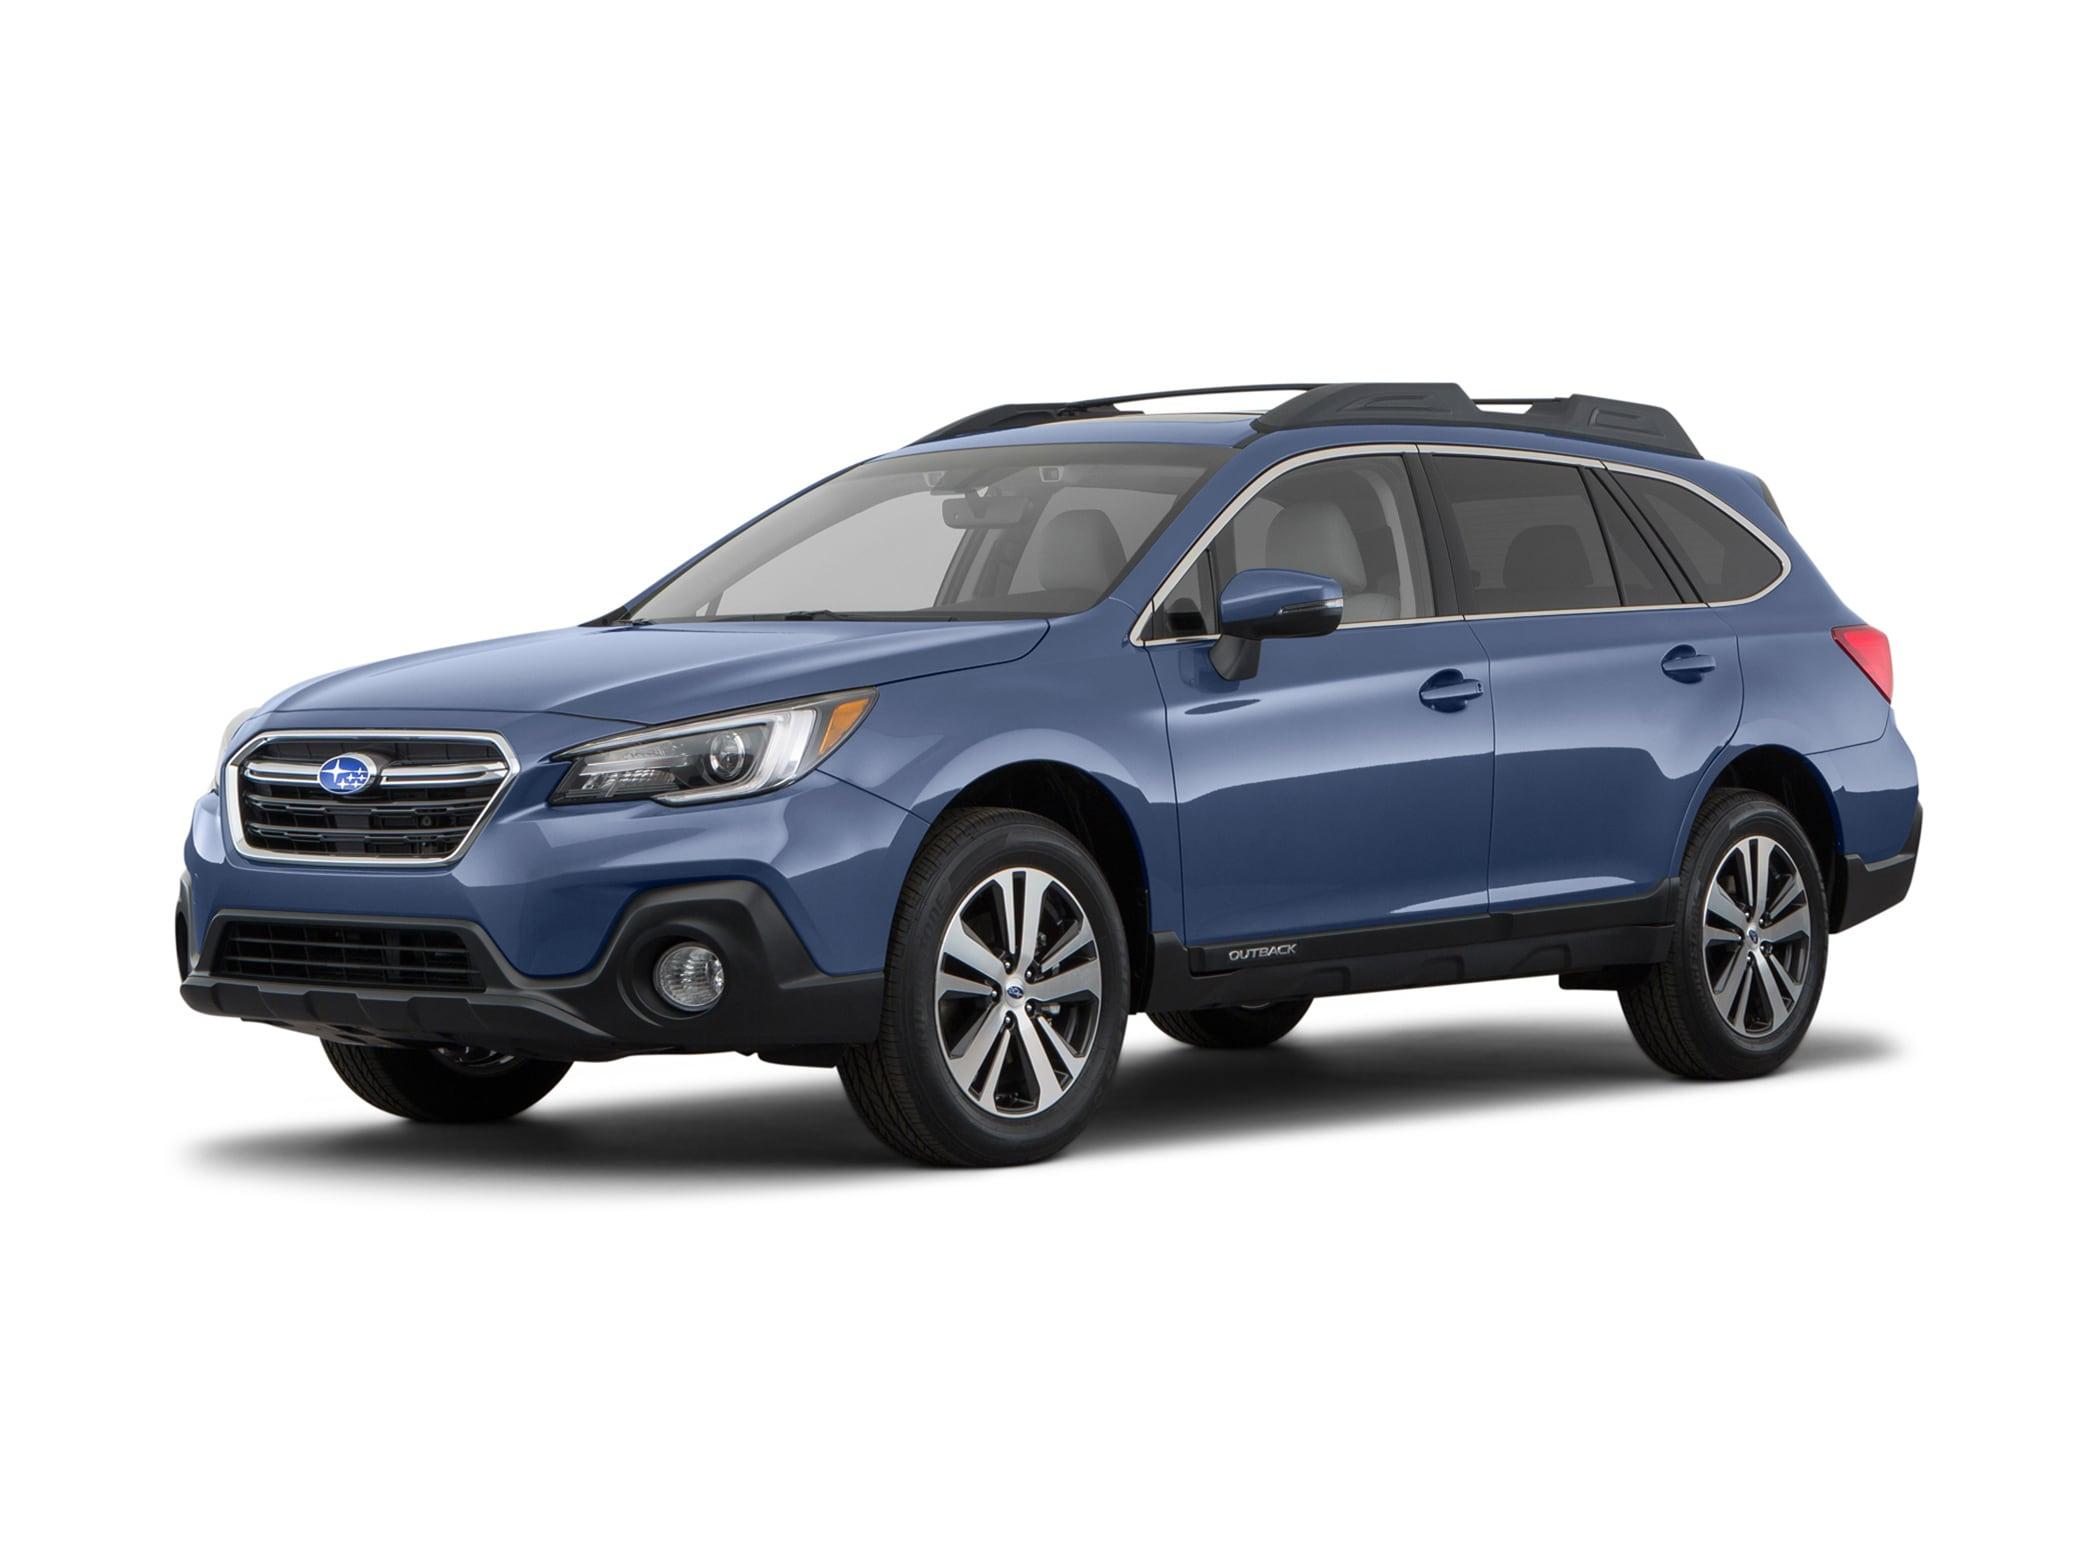 2019 Subaru Outback 36r Limited Suv For Sale In Spokane Wa Vin Basic Remote Start Walkthrough On Your Nissan Infiniti Vehicle 4s4bsejc1k3252975